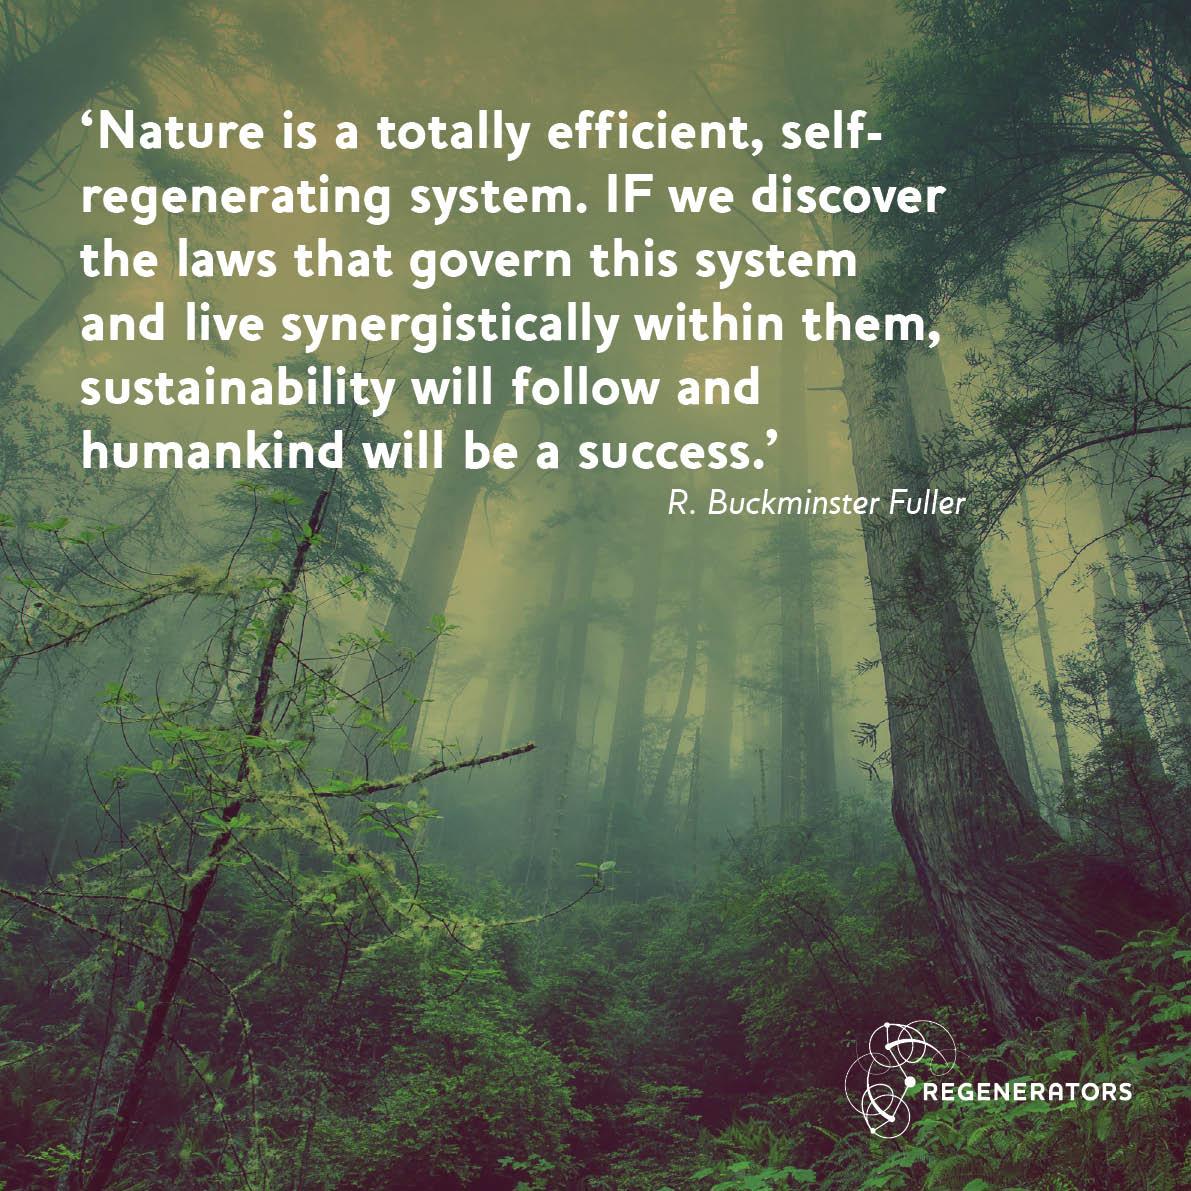 Quote from R. Buckminster Fuller